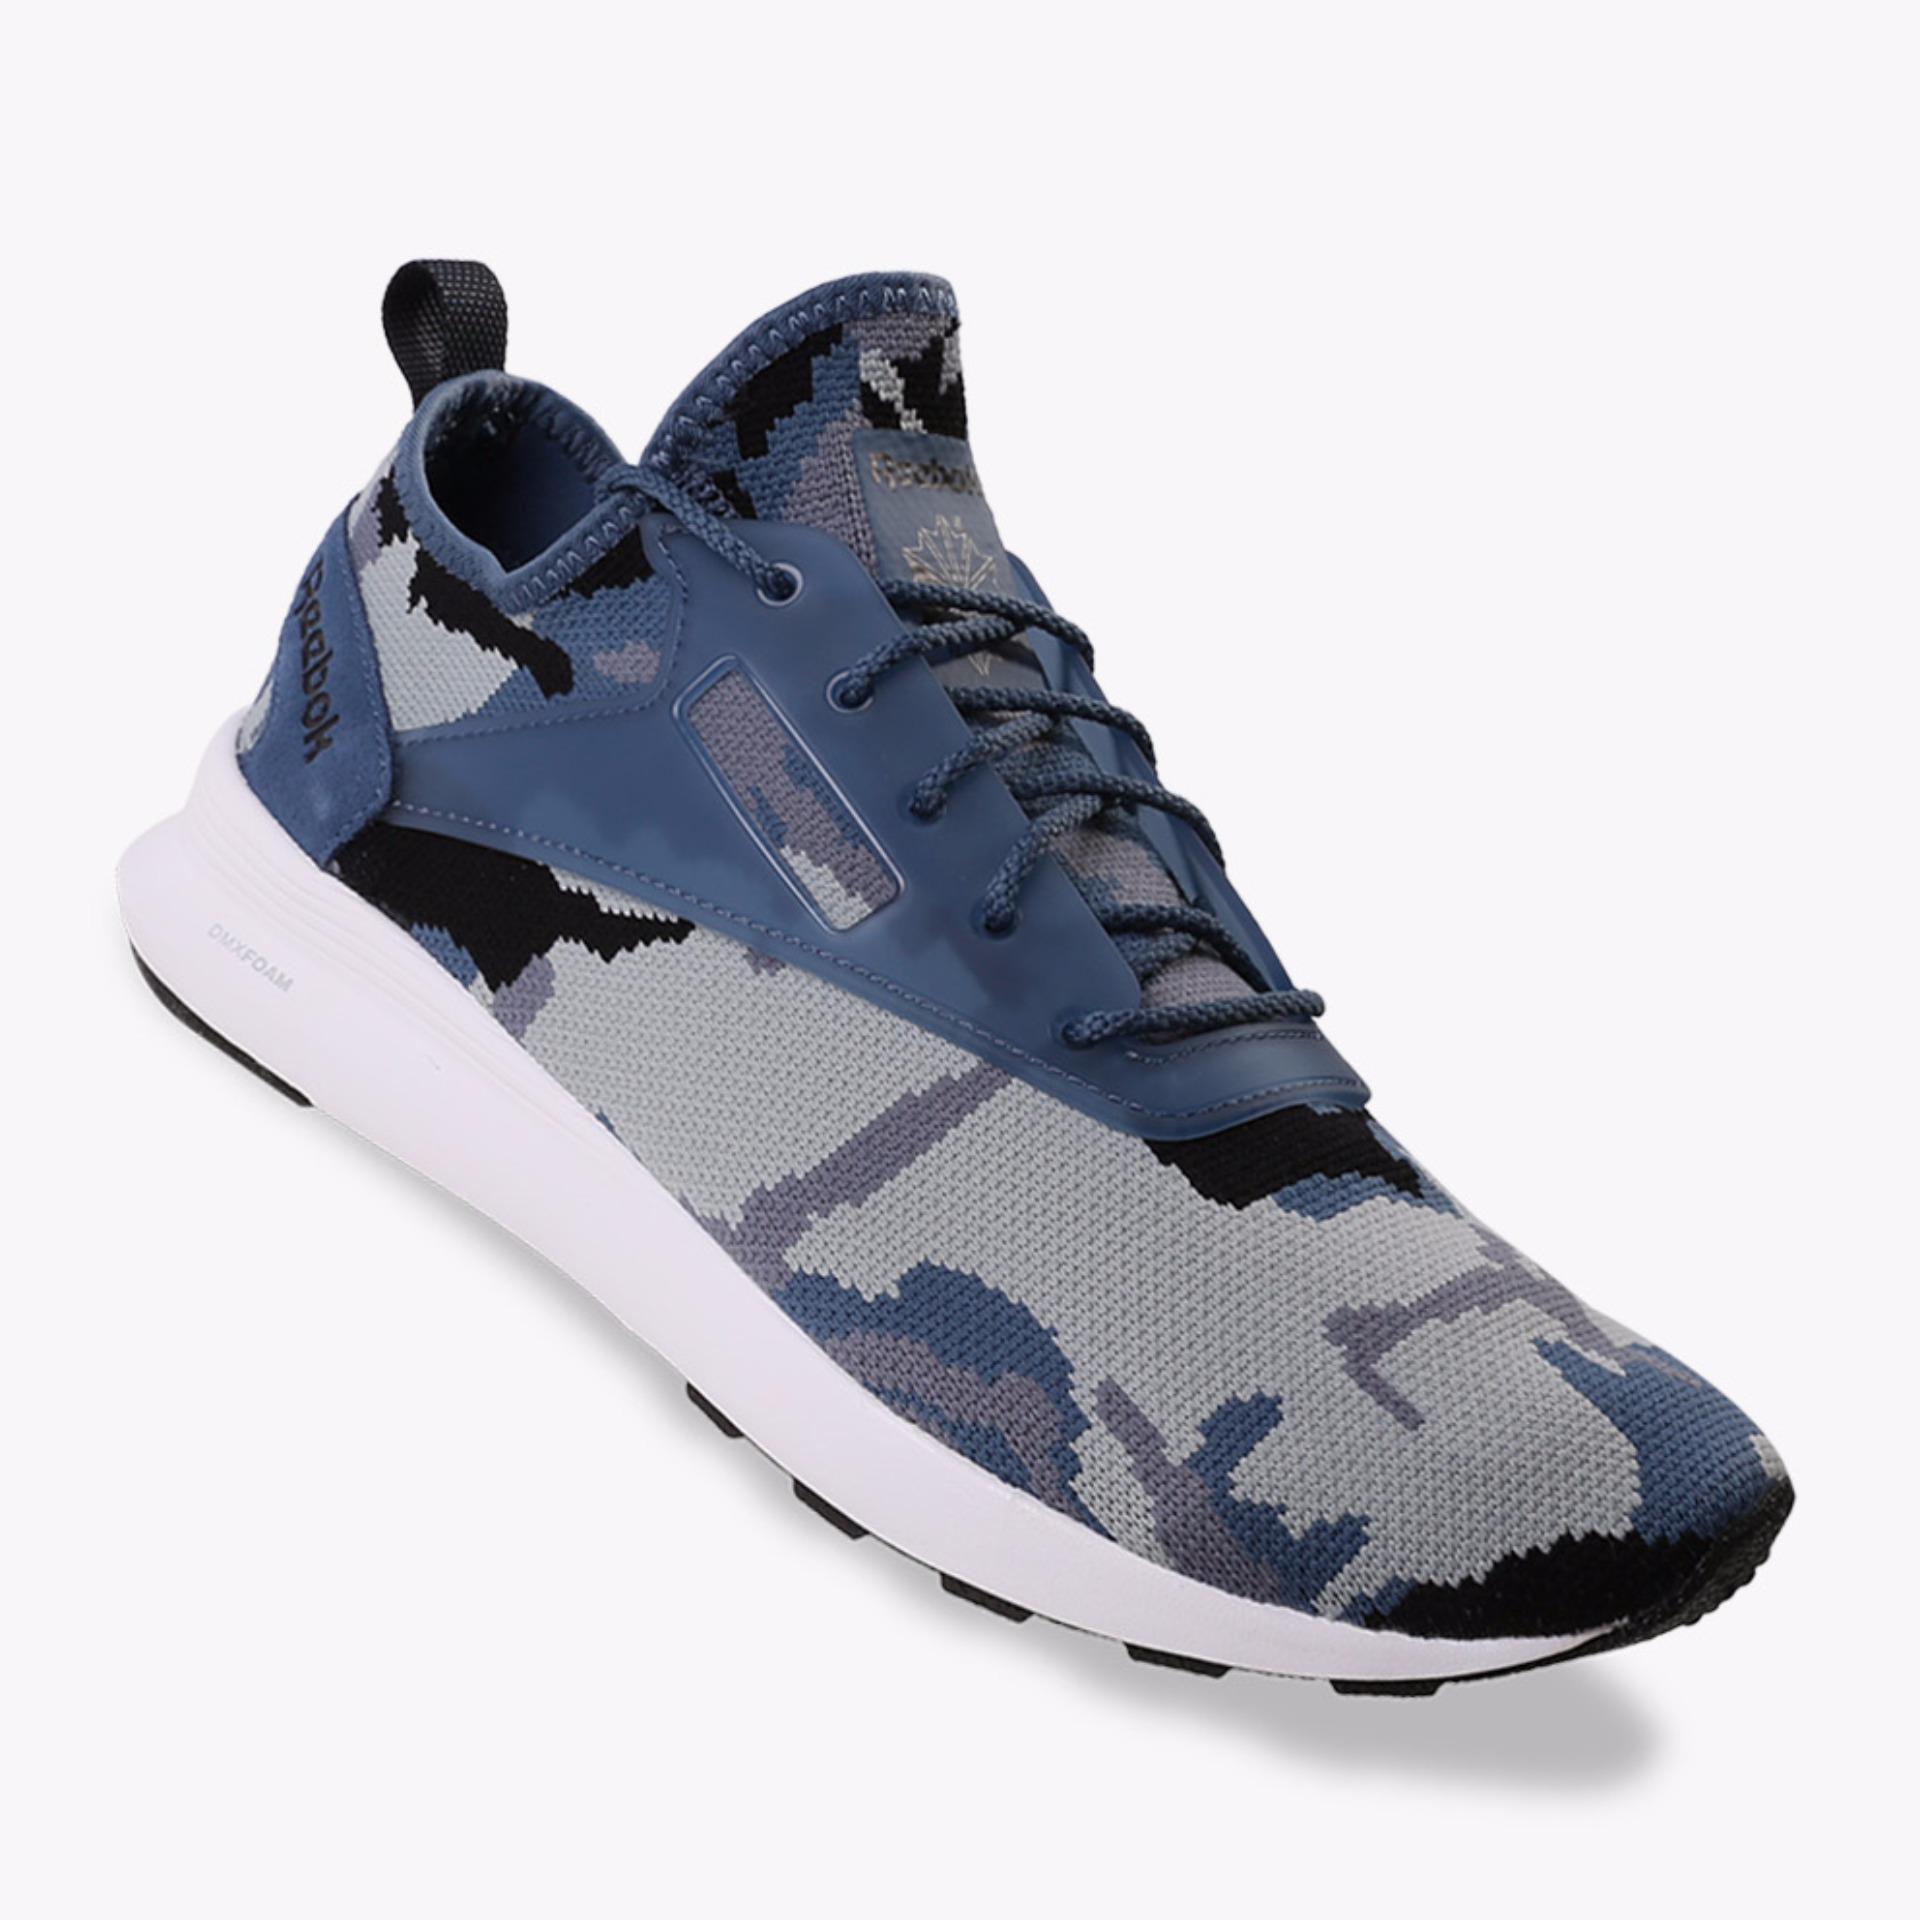 Reebok Zoku Runner Men's Lifestyle Shoes - Multicolor